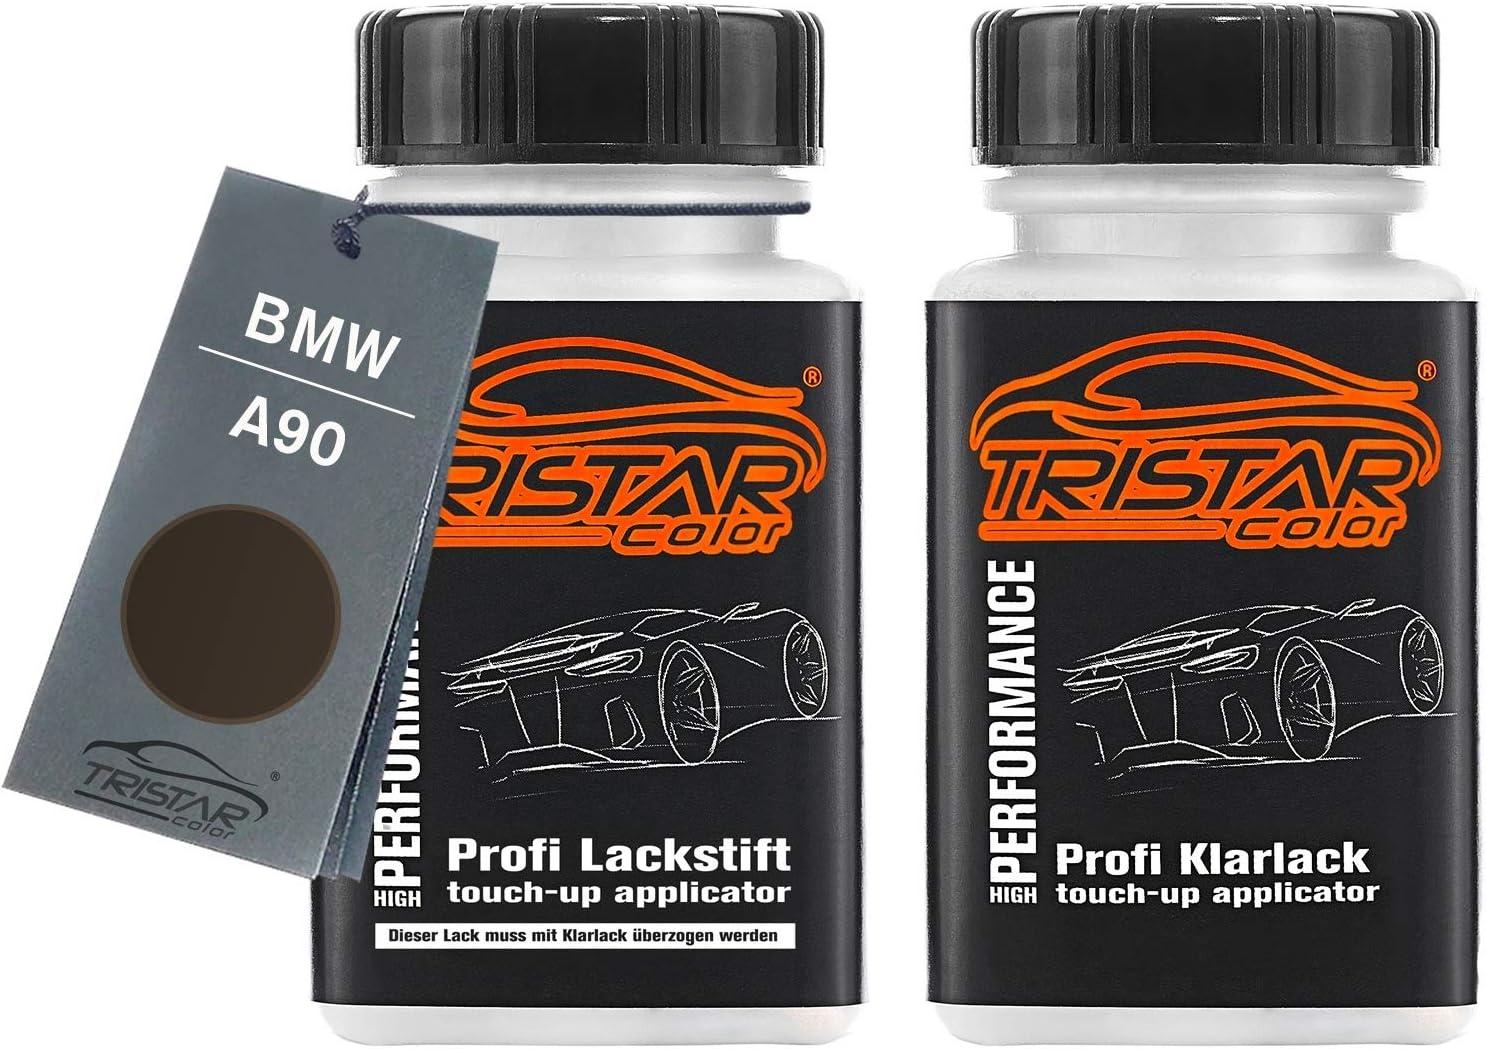 Tristarcolor Autolack Lackstift Set Für Bmw A90 Sophistograu Brillant Metallic Basislack Klarlack Je 50ml Auto